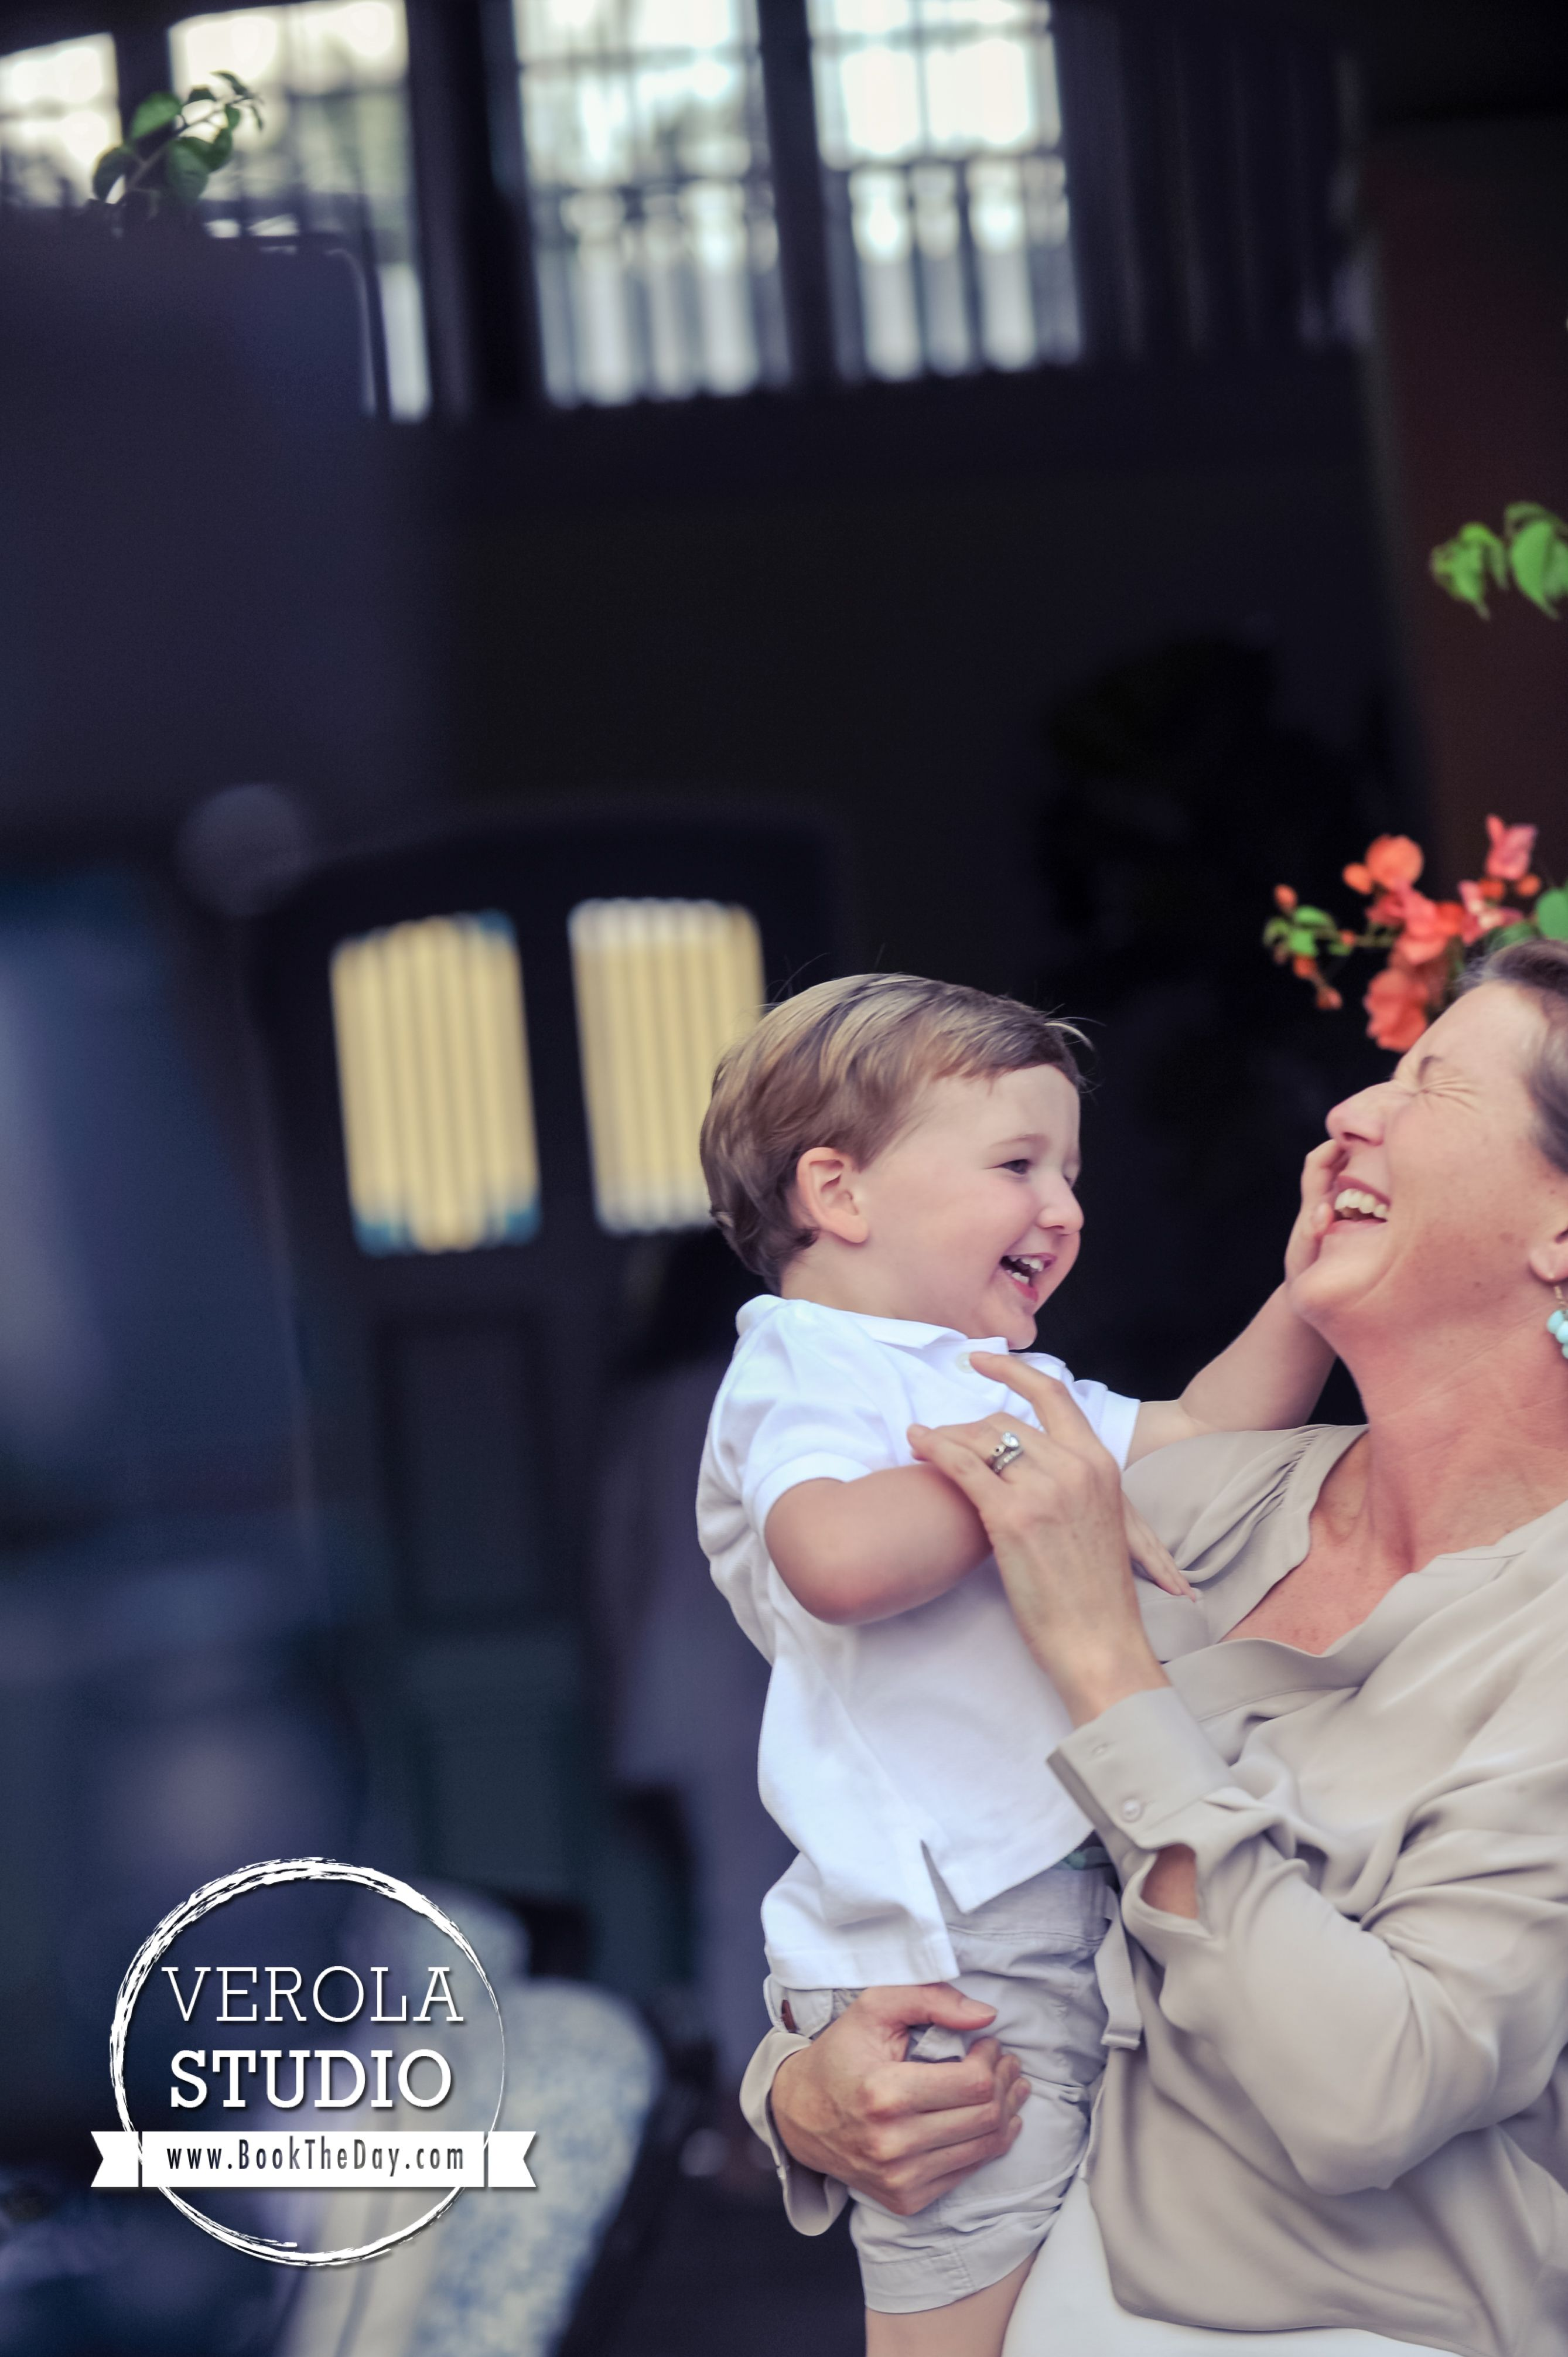 Every grandmother deserves a photo like this! #grandchild #grandma #family #photography #love #joy #laughter #verolastudio #candid